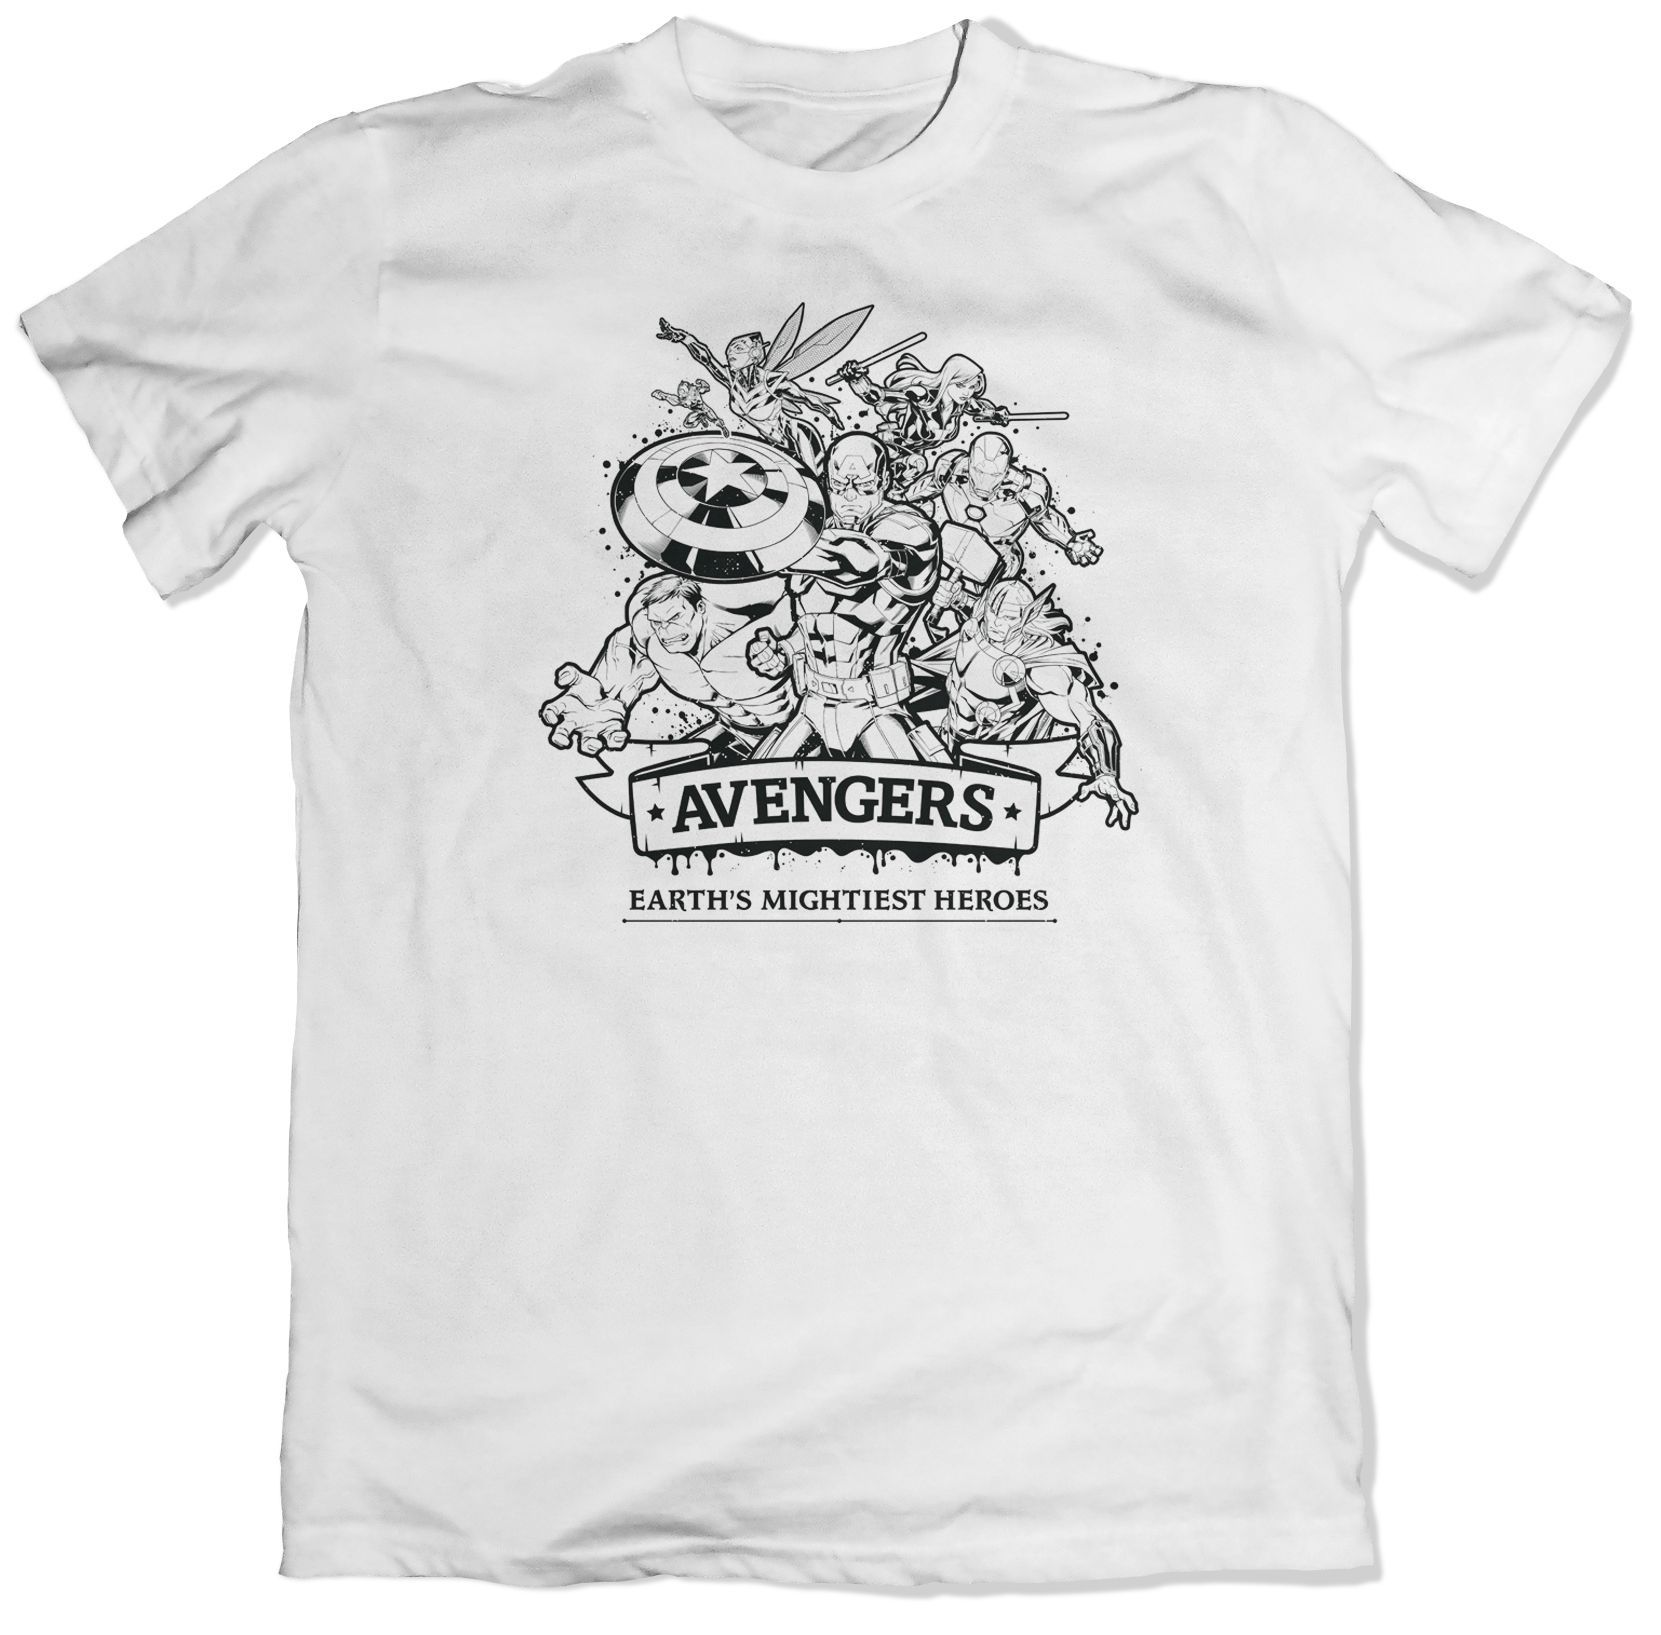 Тениска Avengers - Earth's Mightiest Heroes, бяла - 1